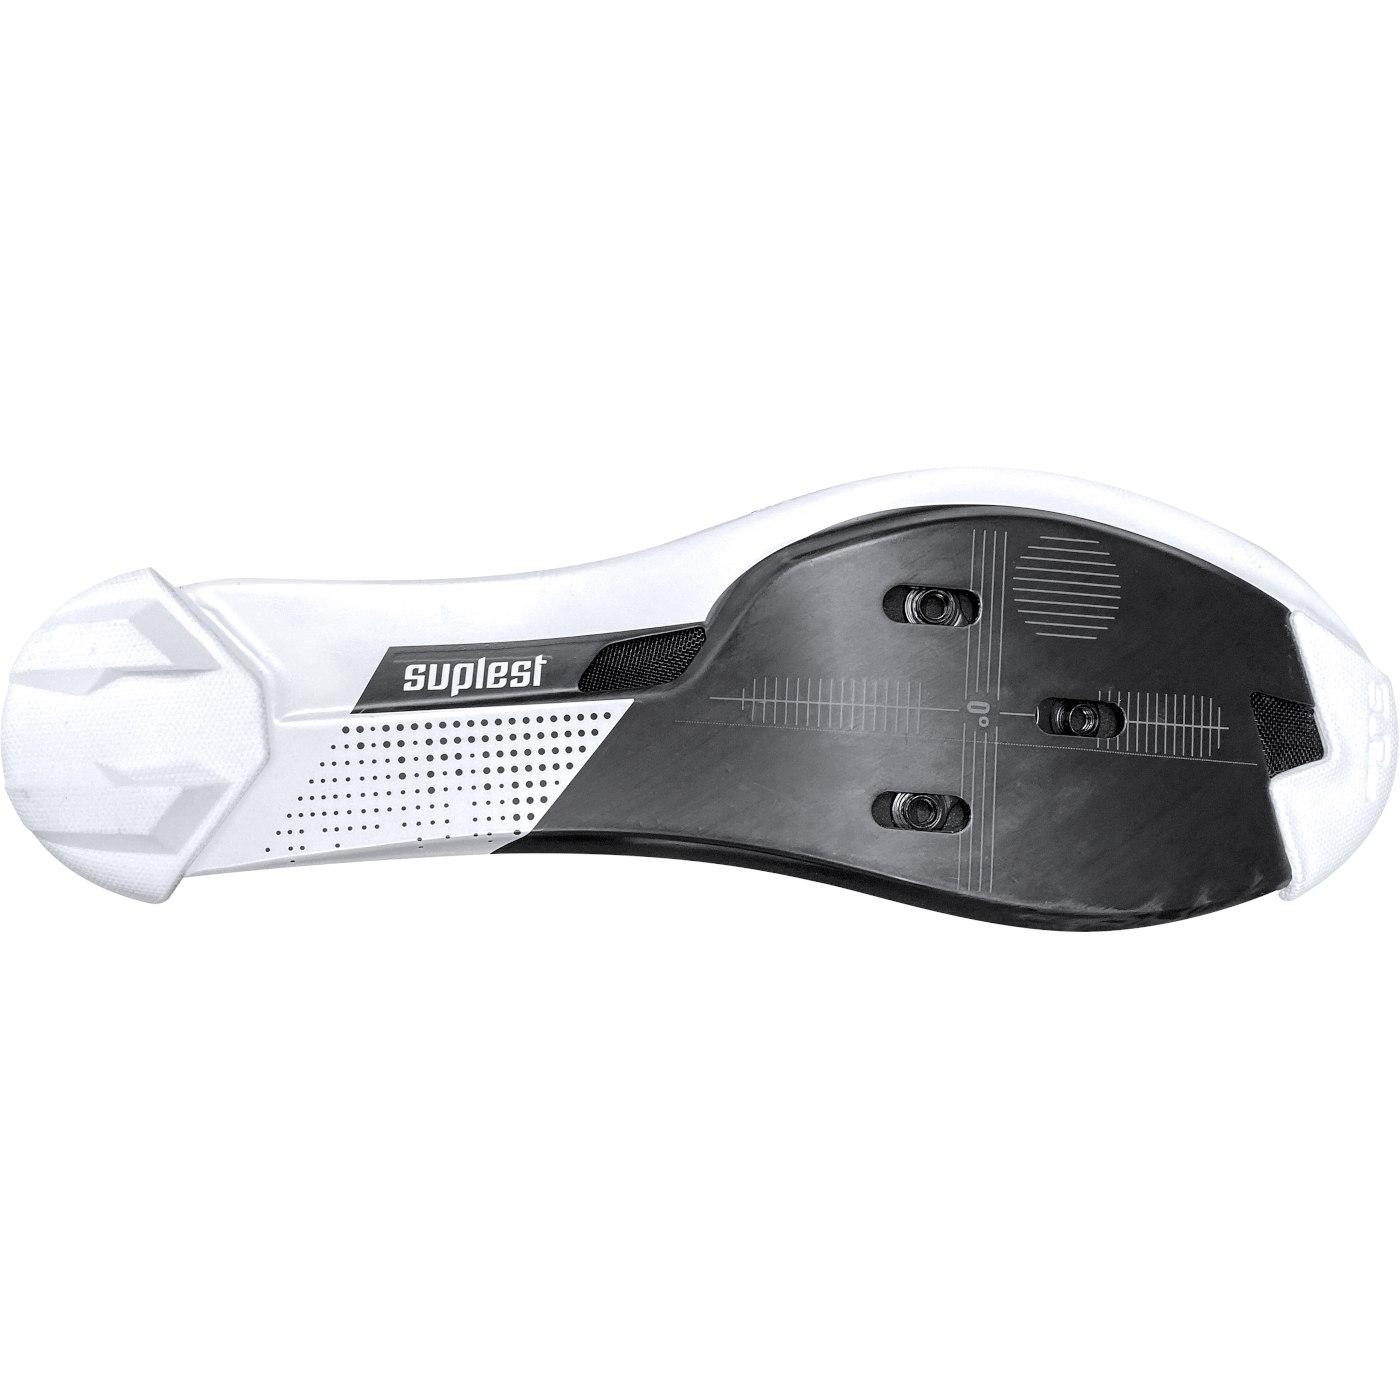 Image of Suplest EDGE+ Double BOA IP1 Road Pro Shoe - White / Black 01.062.